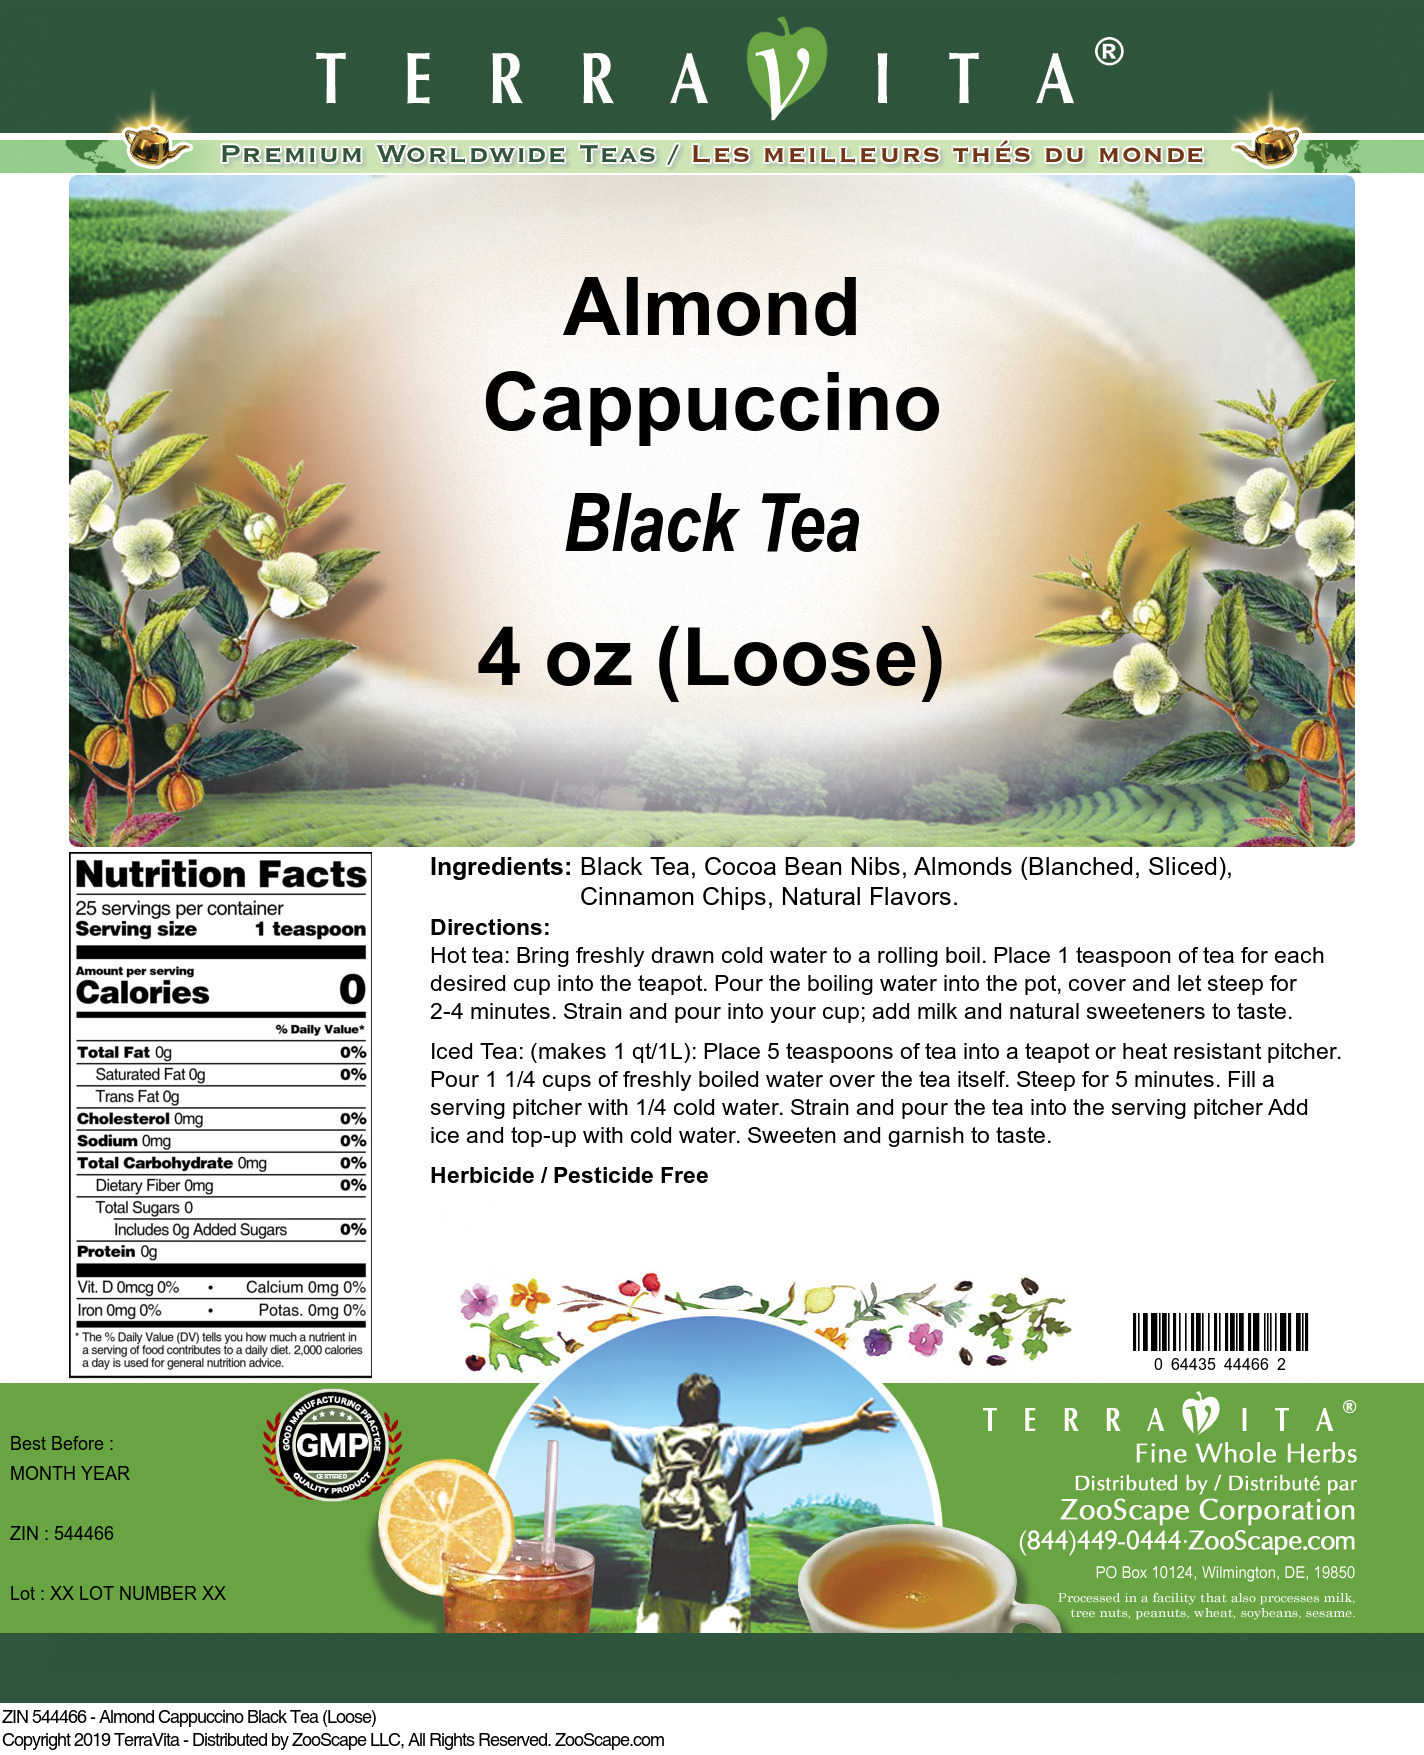 Almond Cappuccino Black Tea